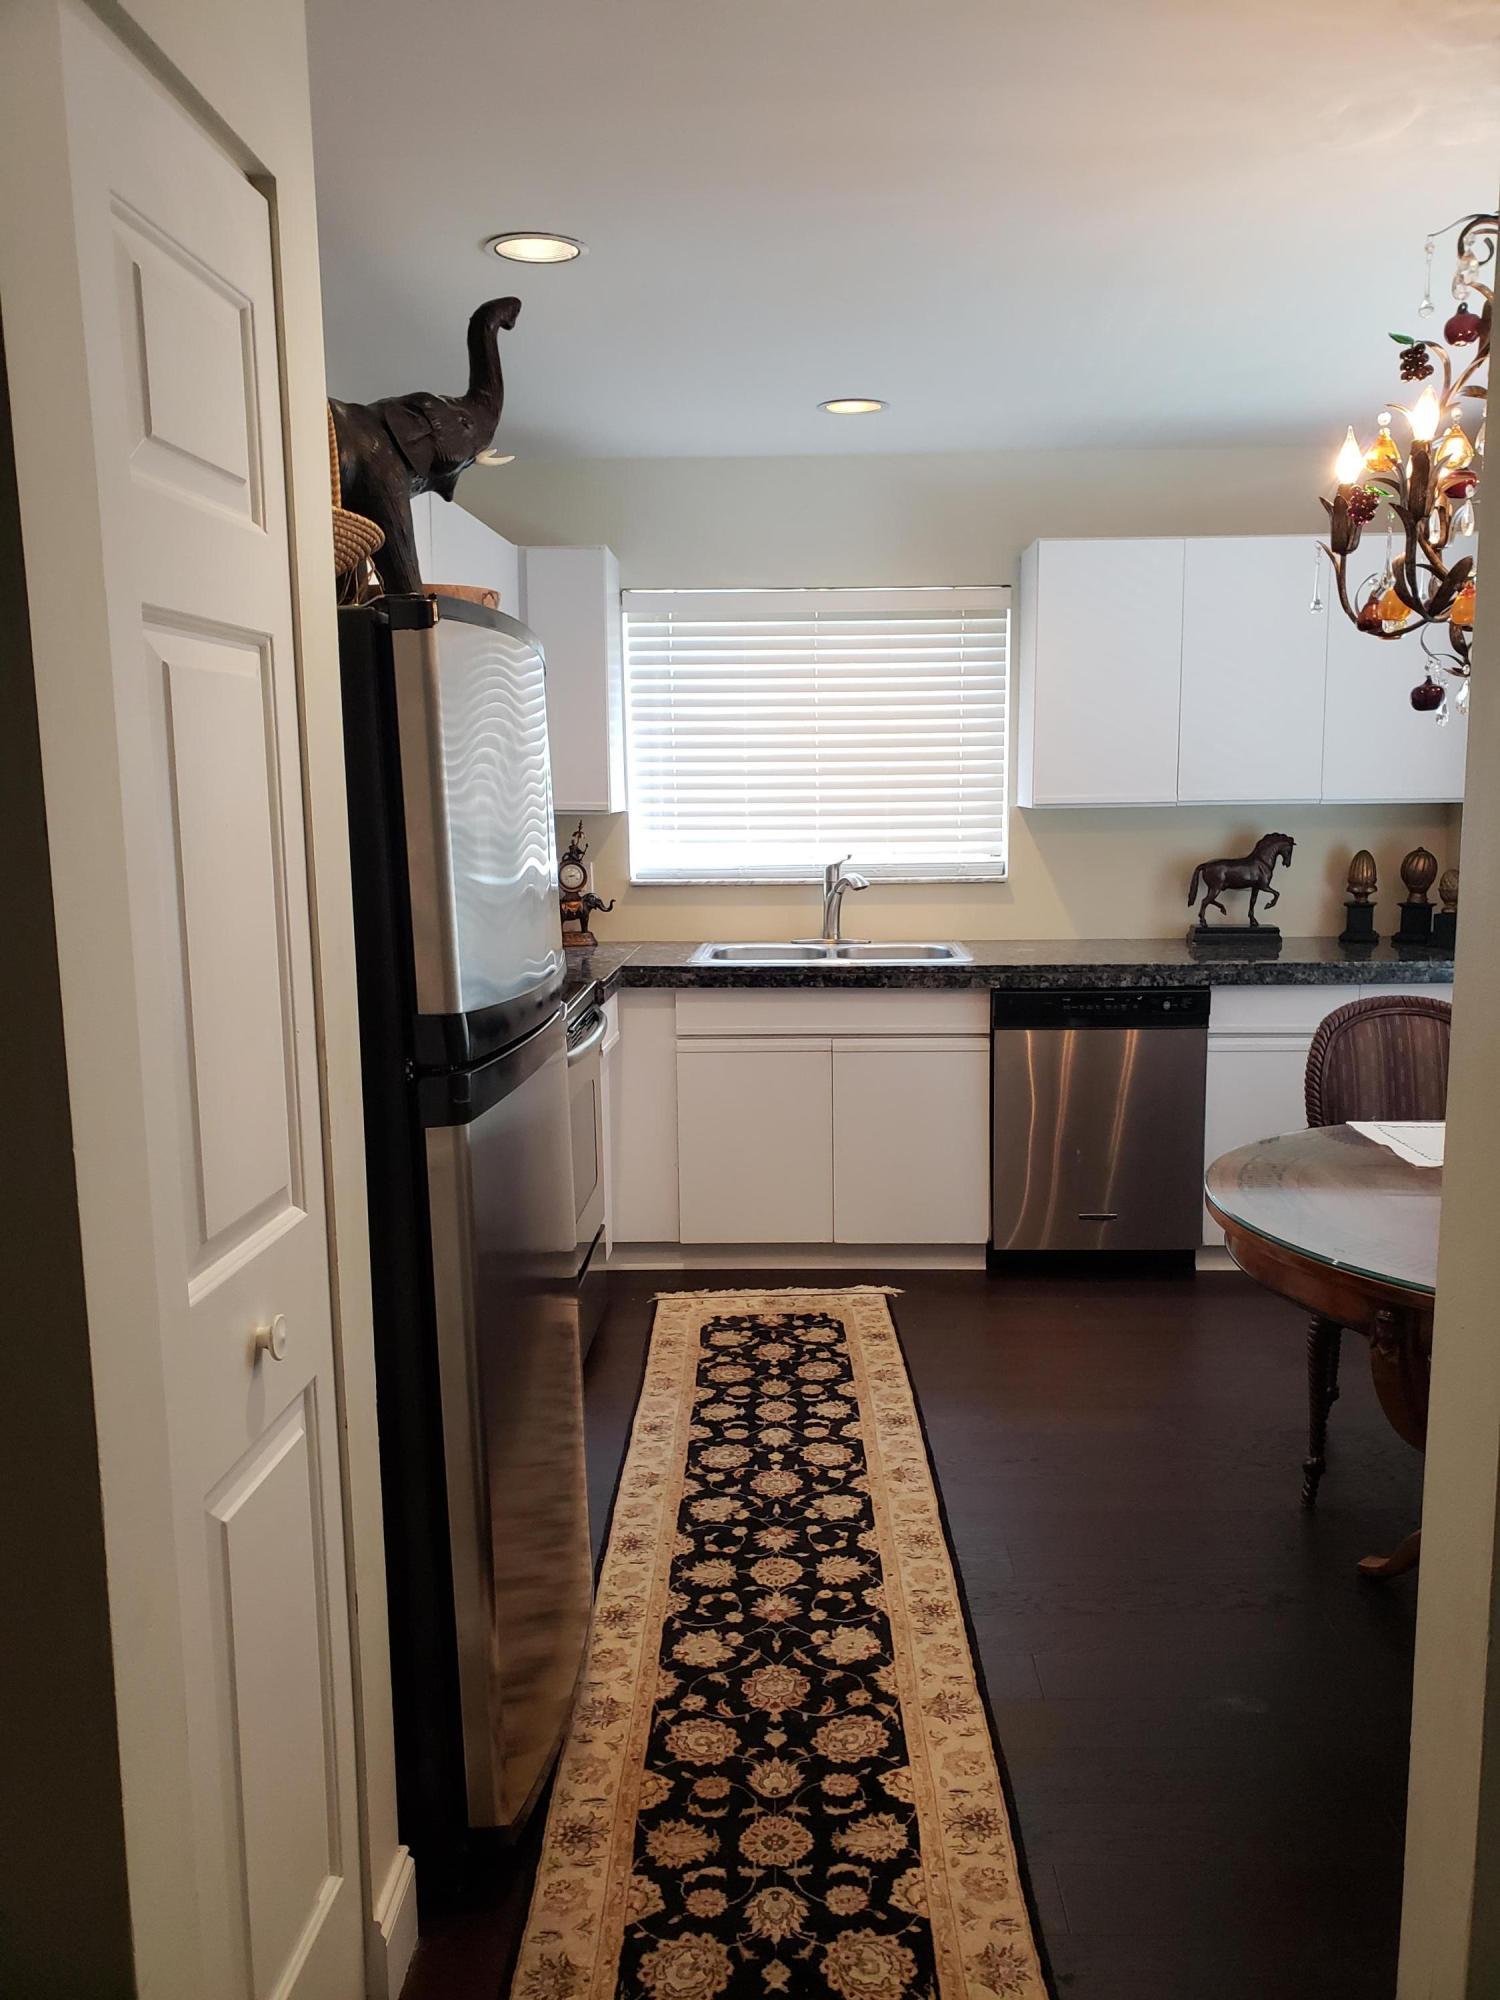 5 Lexington Lane H, Palm Beach Gardens, Florida 33418, 3 Bedrooms Bedrooms, ,2 BathroomsBathrooms,F,Townhouse,Lexington,RX-10478061